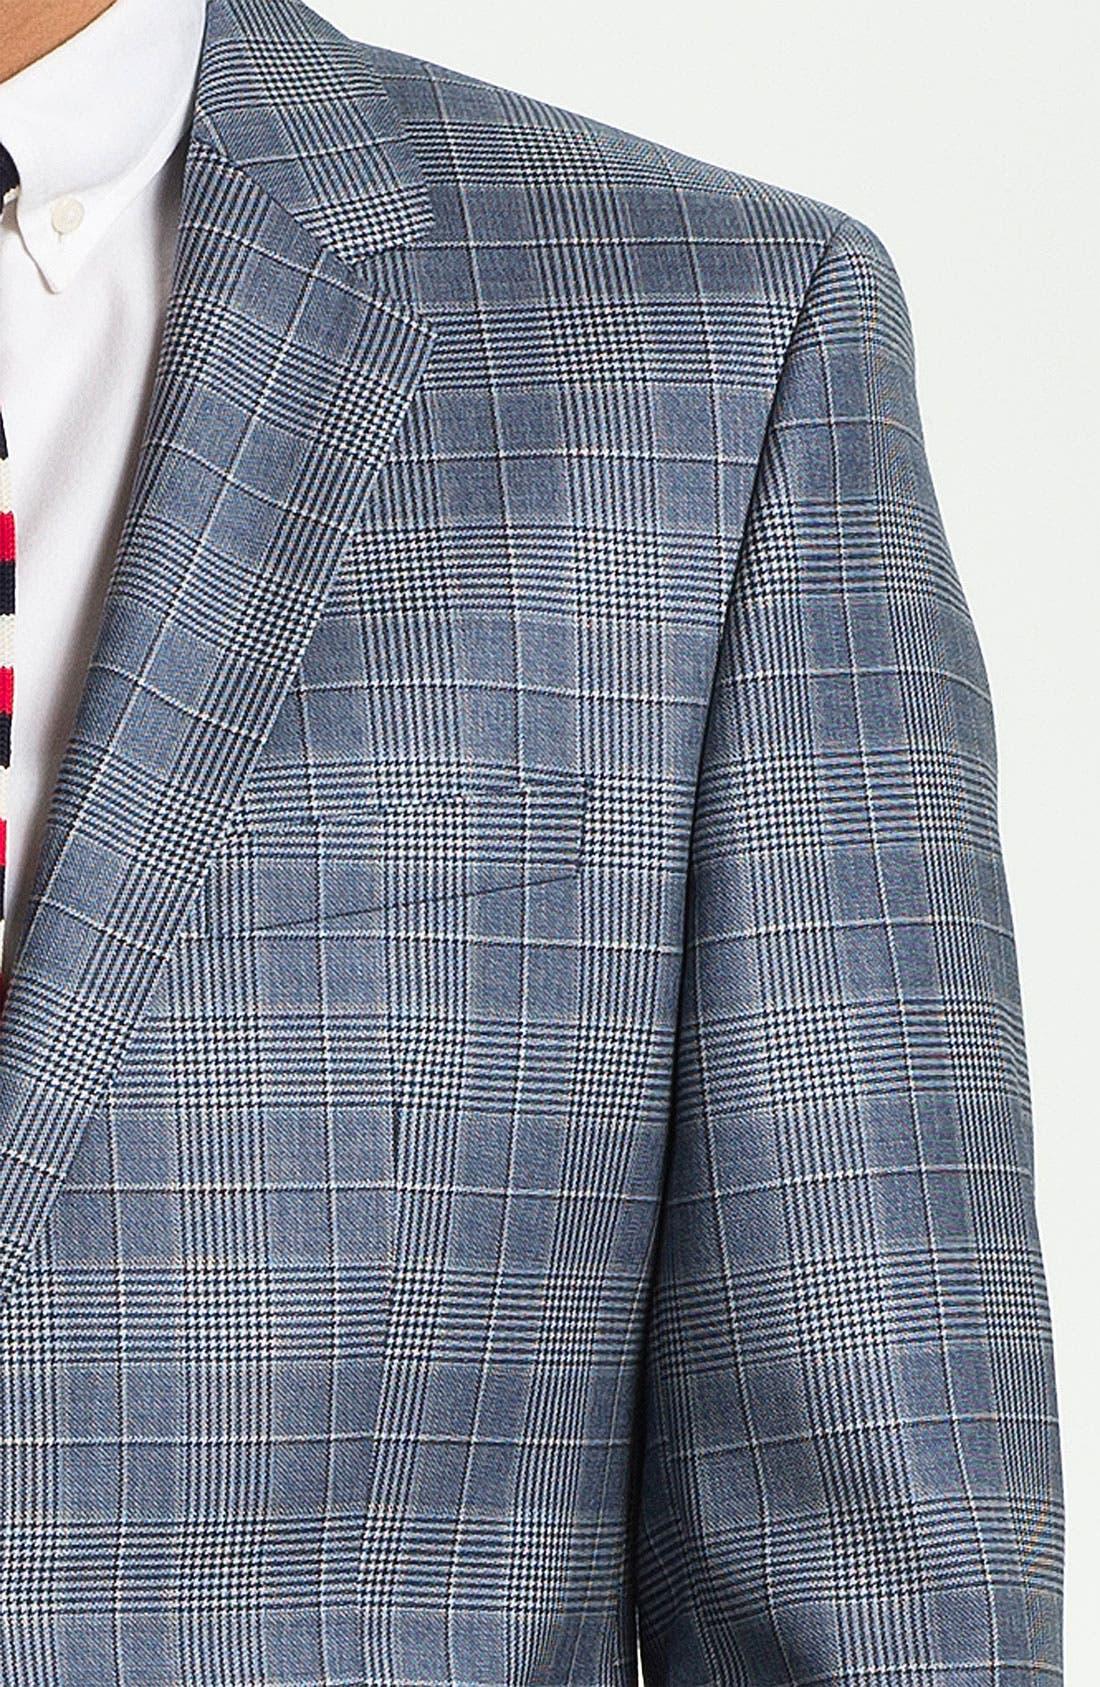 ZZDNUHUGO BOSS, BOSS Black 'James' Trim Fit Plaid Sportcoat, Alternate thumbnail 4, color, 460